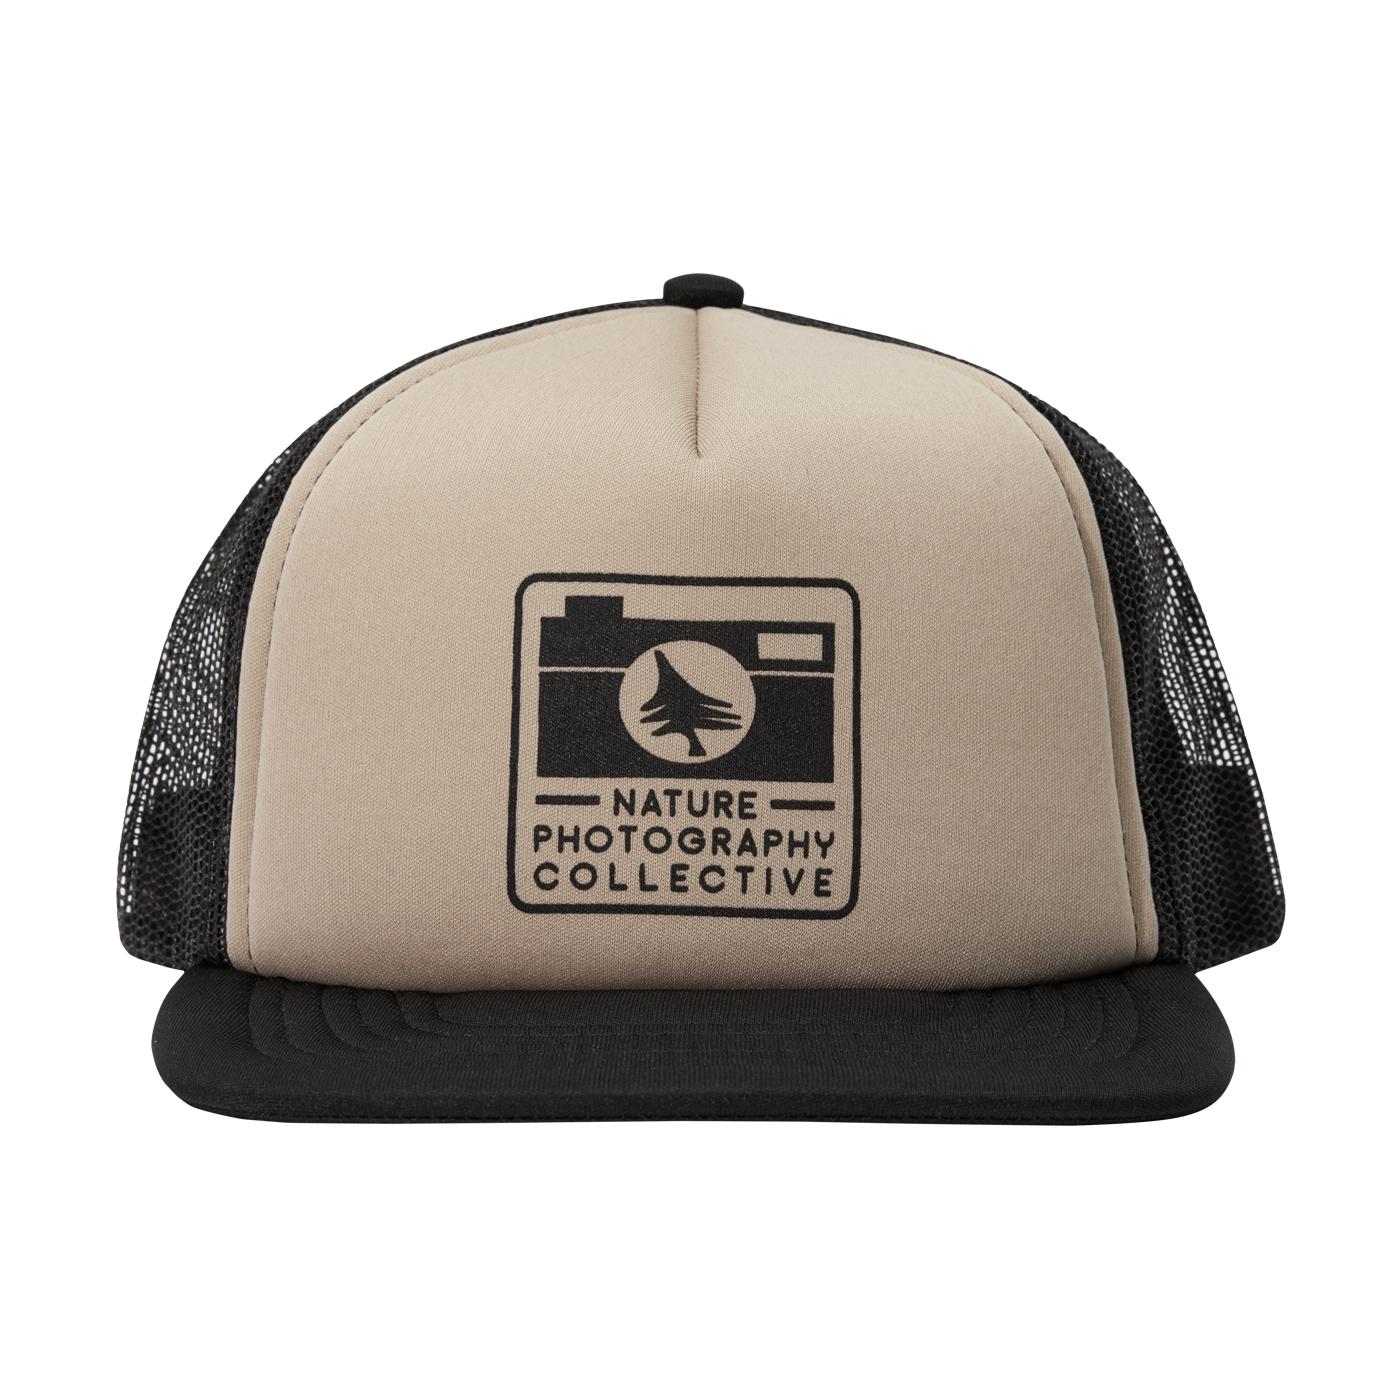 Npc Trucker Hat Tan   HippyTree a6302854cac